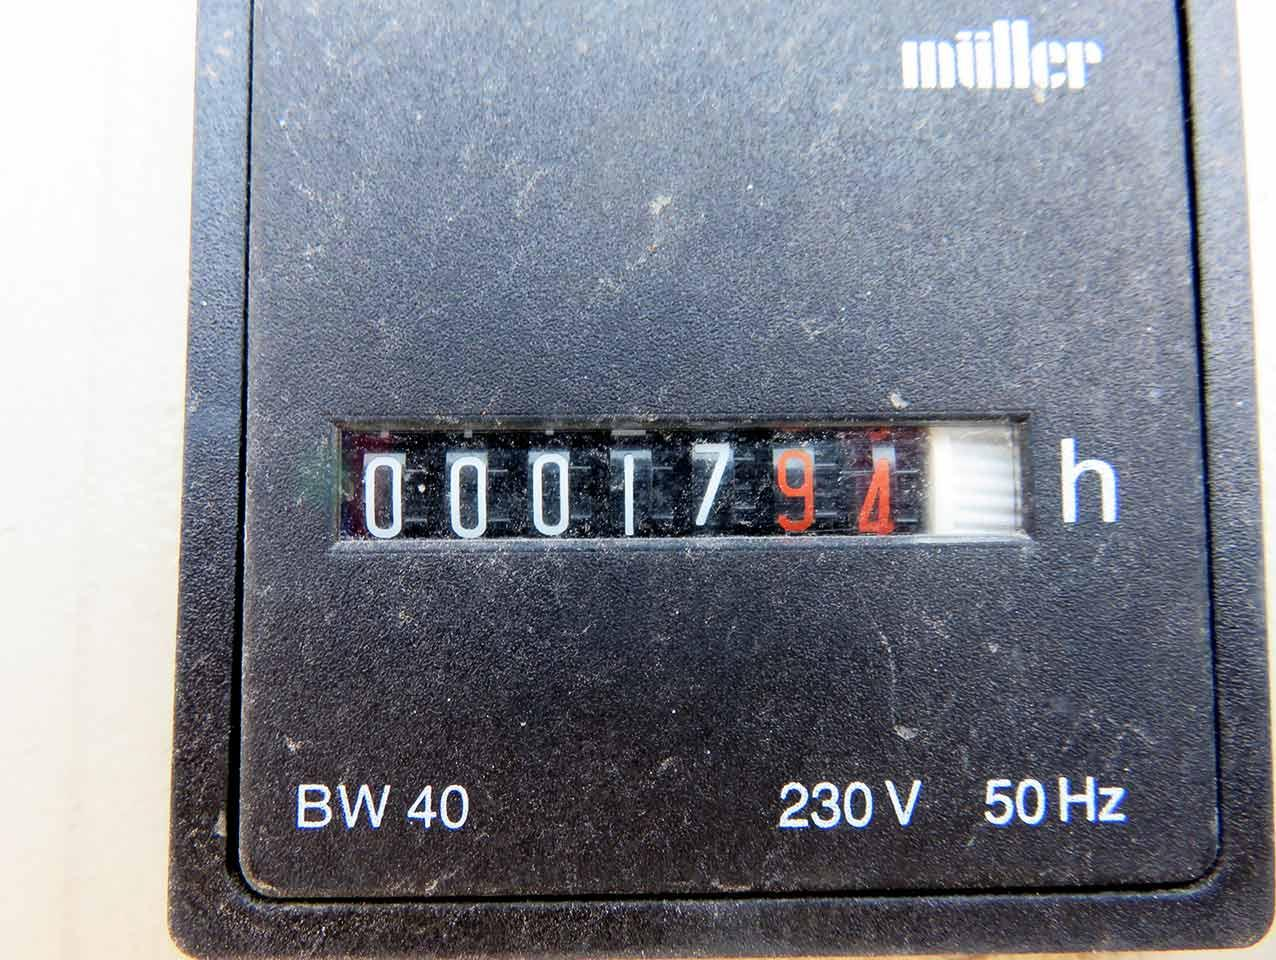 VEM generator Operating hours